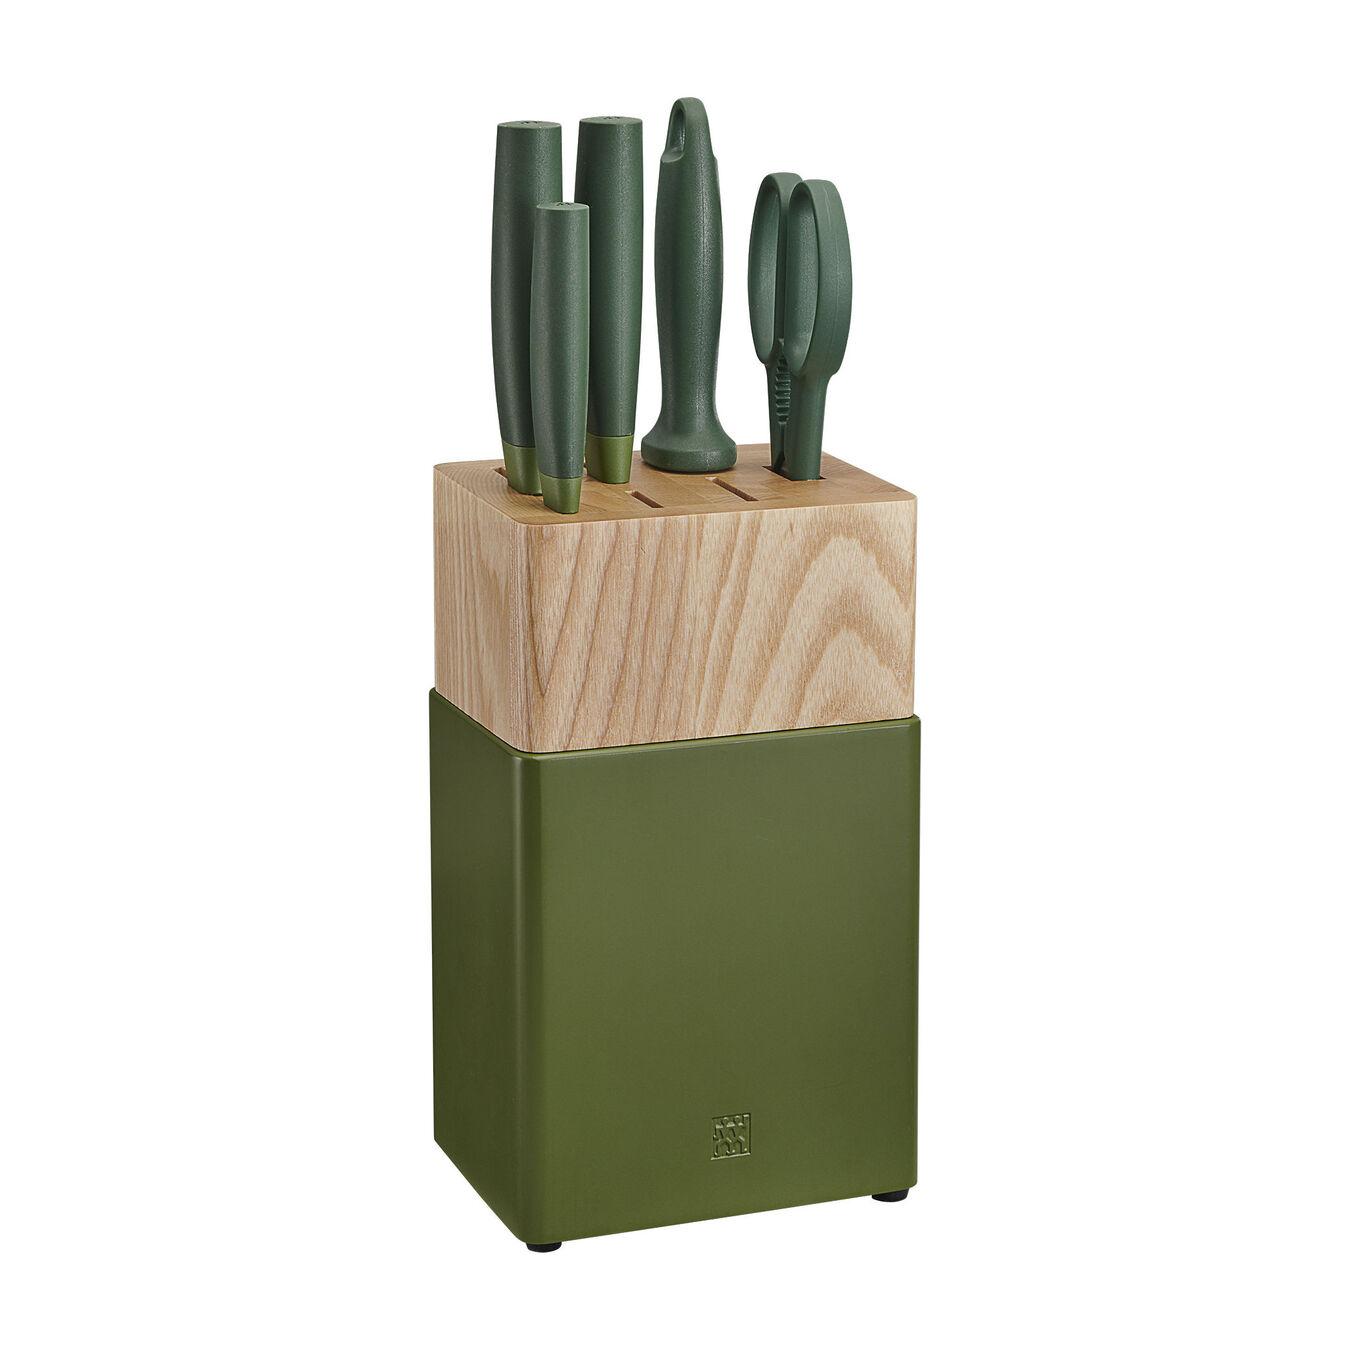 6-pc Knife Block Set - Lime Green,,large 1